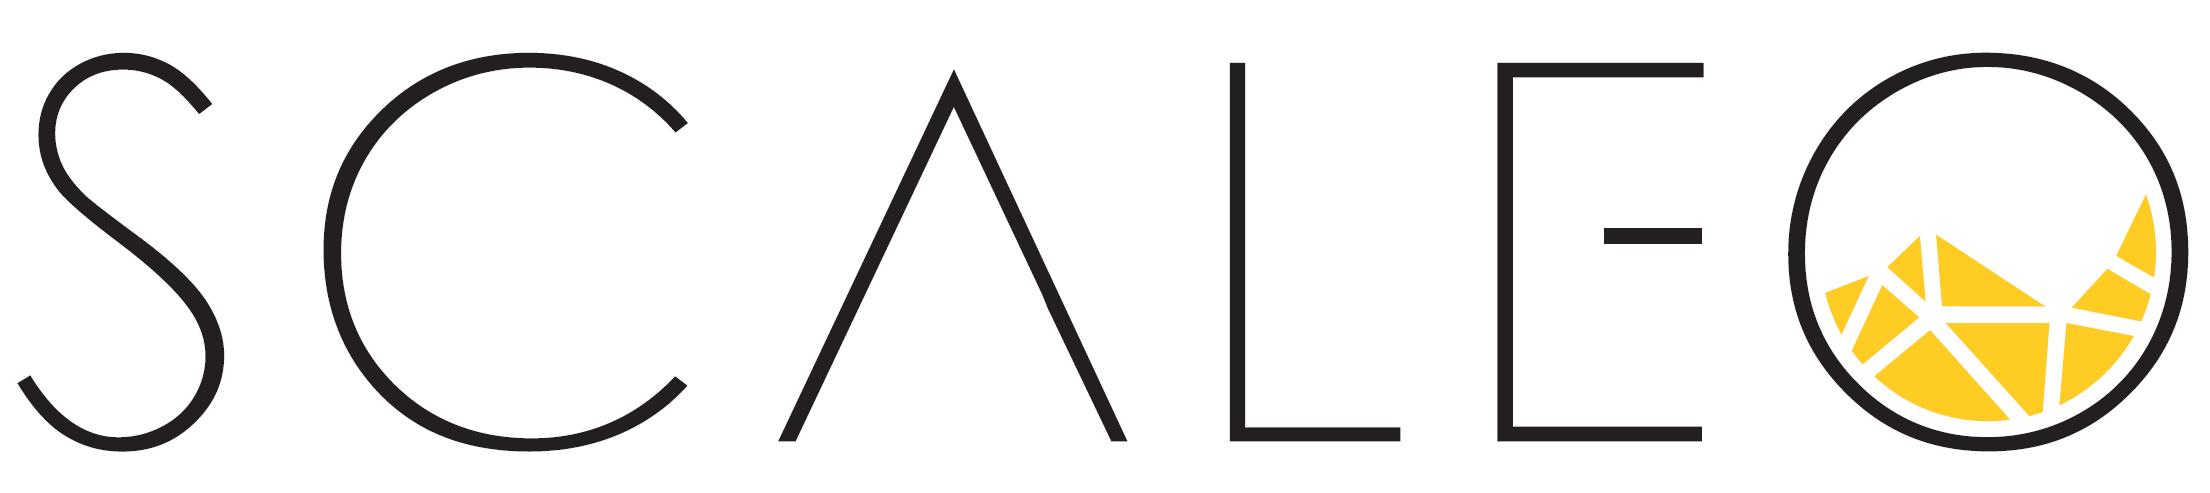 SCALEO